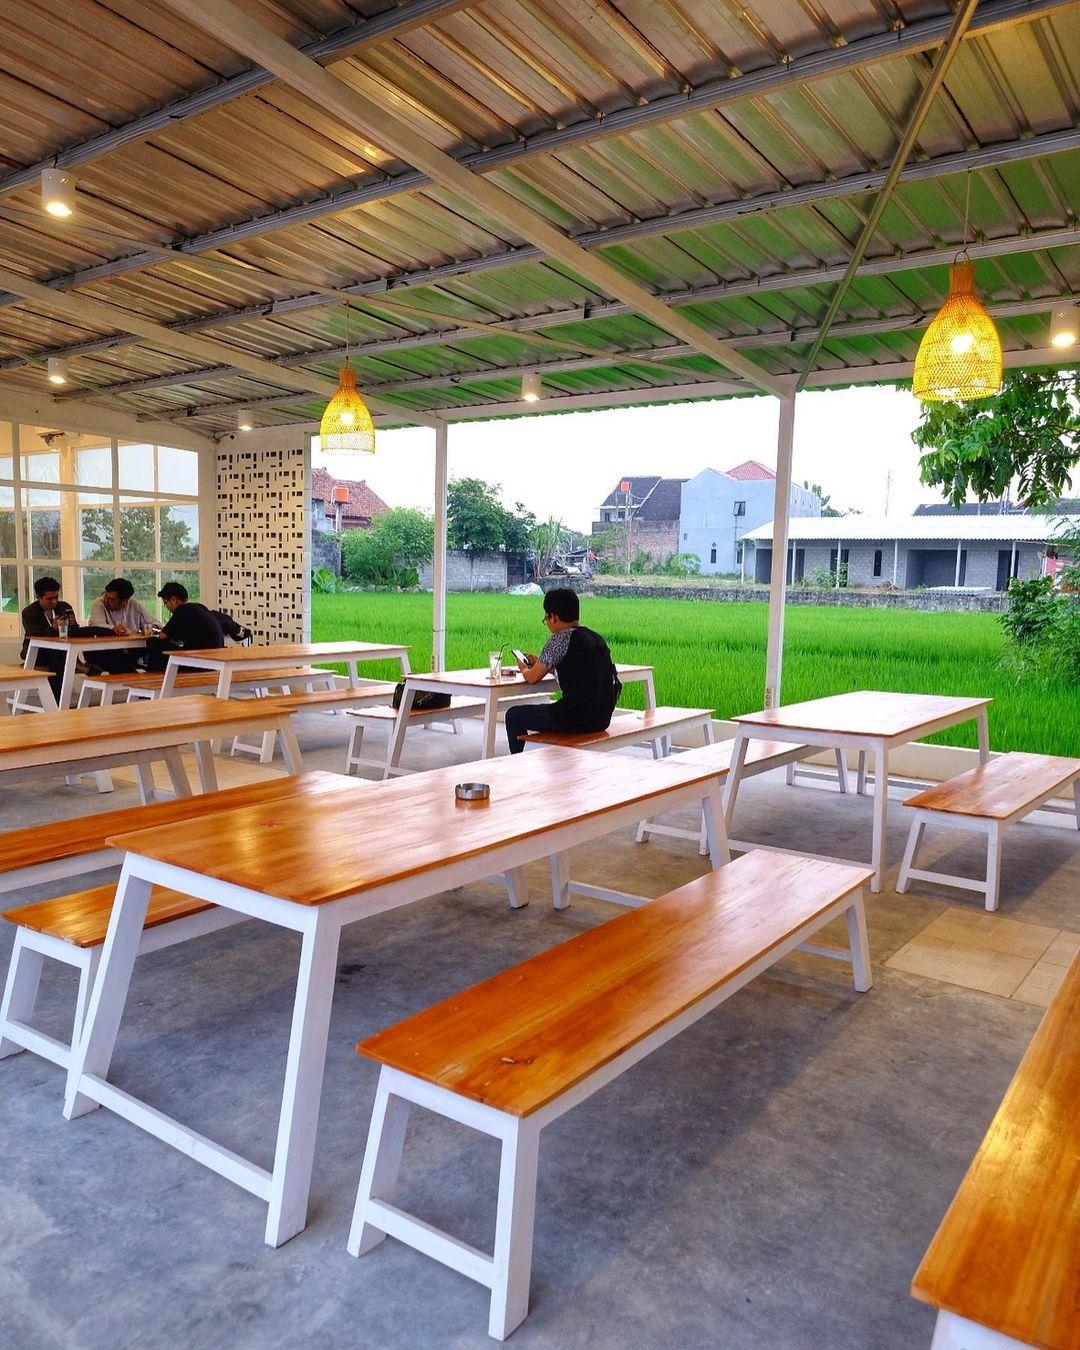 Suasana Di Cafe Nilu Kopi Jogja Image From @jogja24jam